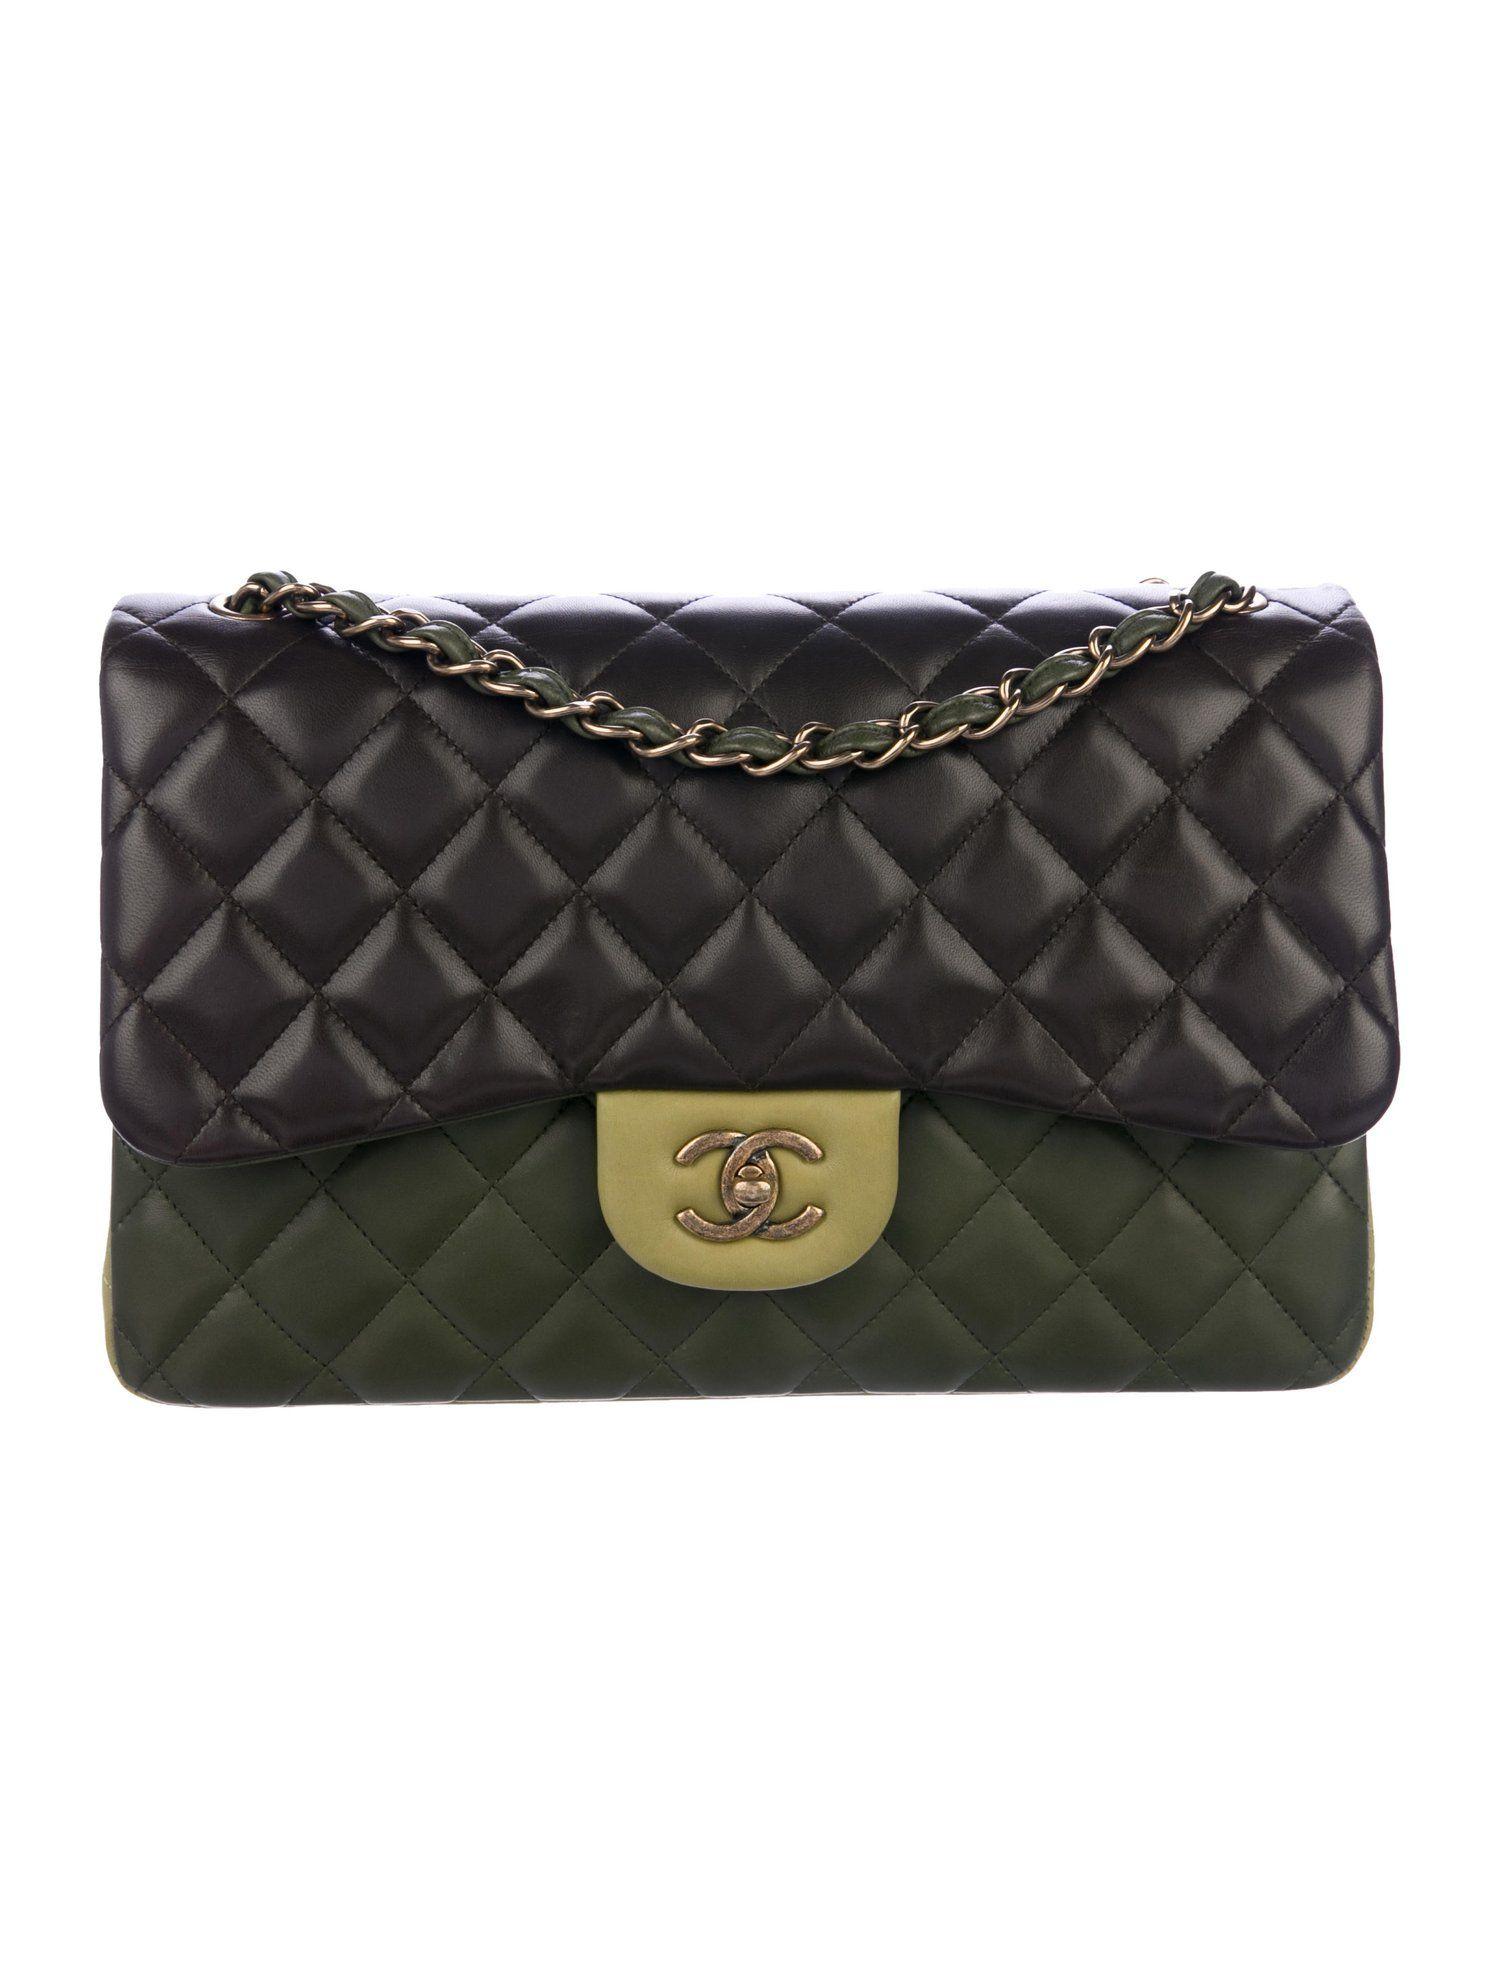 fcaf2b7216c1 Chanel Paris Edinburgh Tricolor Jumbo Double Flap Bag - Handbags -  CHA335471 | The RealReal